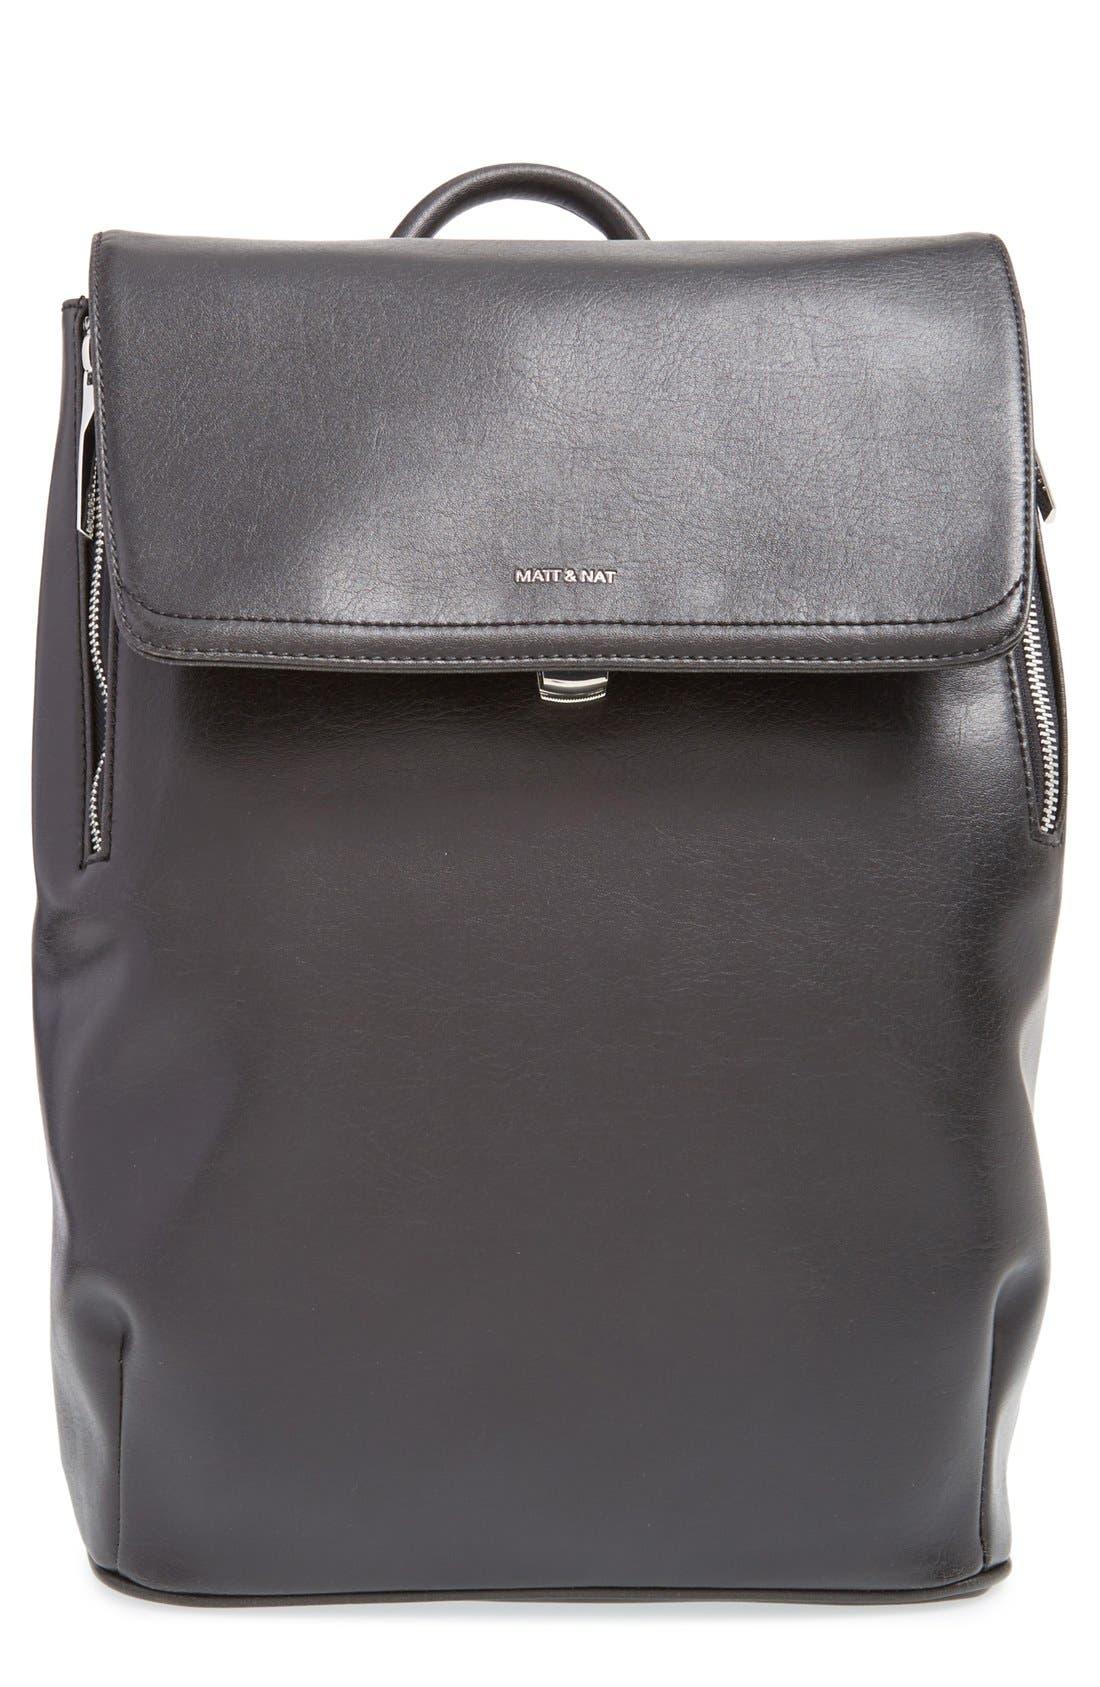 Alternate Image 1 Selected - Matt & Nat 'Fabi' Faux Leather Laptop Backpack